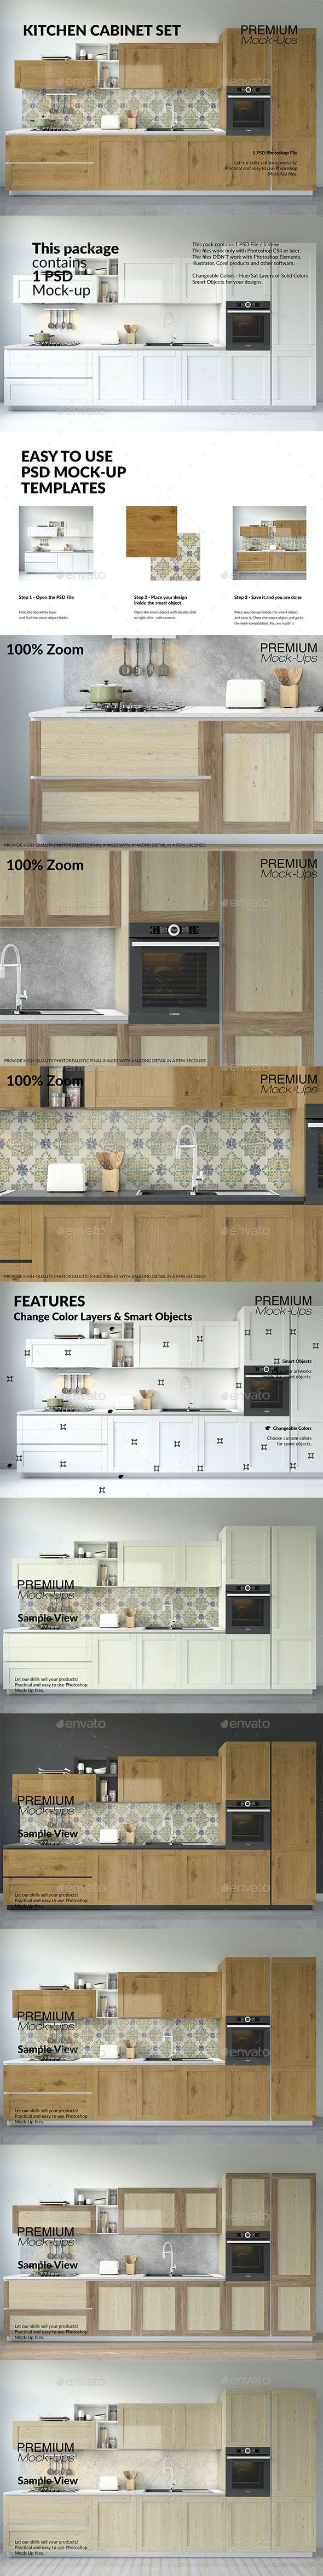 Kitchen Cabinet Set - Product Mock-Ups Graphics